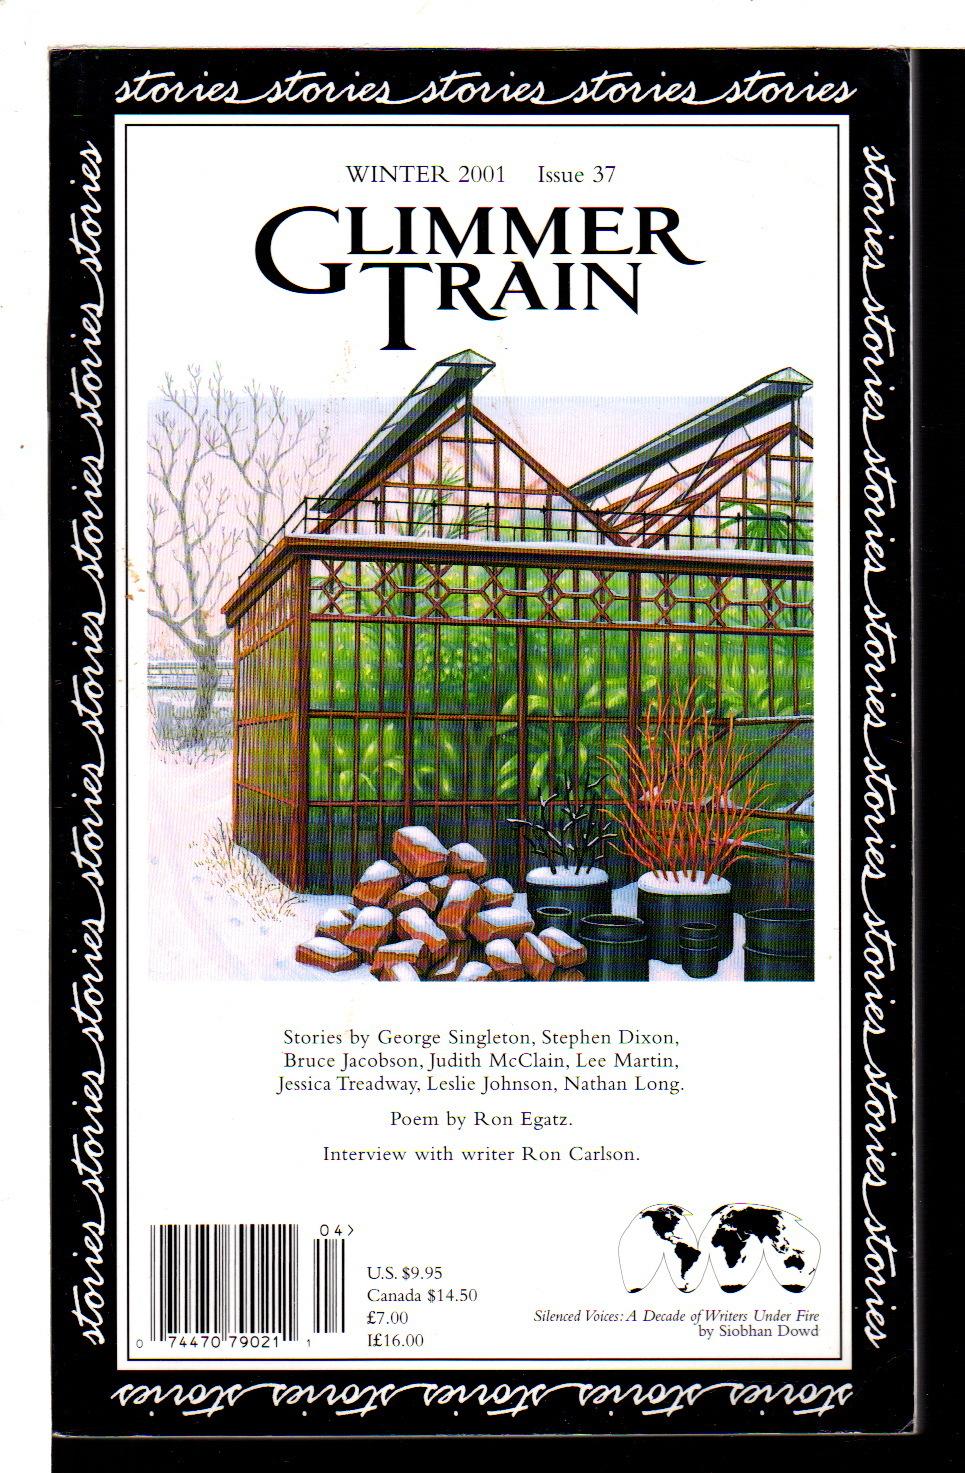 BURMEISTER, SUSAN AND LINDA DAVIES,  EDITORS. - GLIMMER TRAIN: Winter 2001, Issue 37.